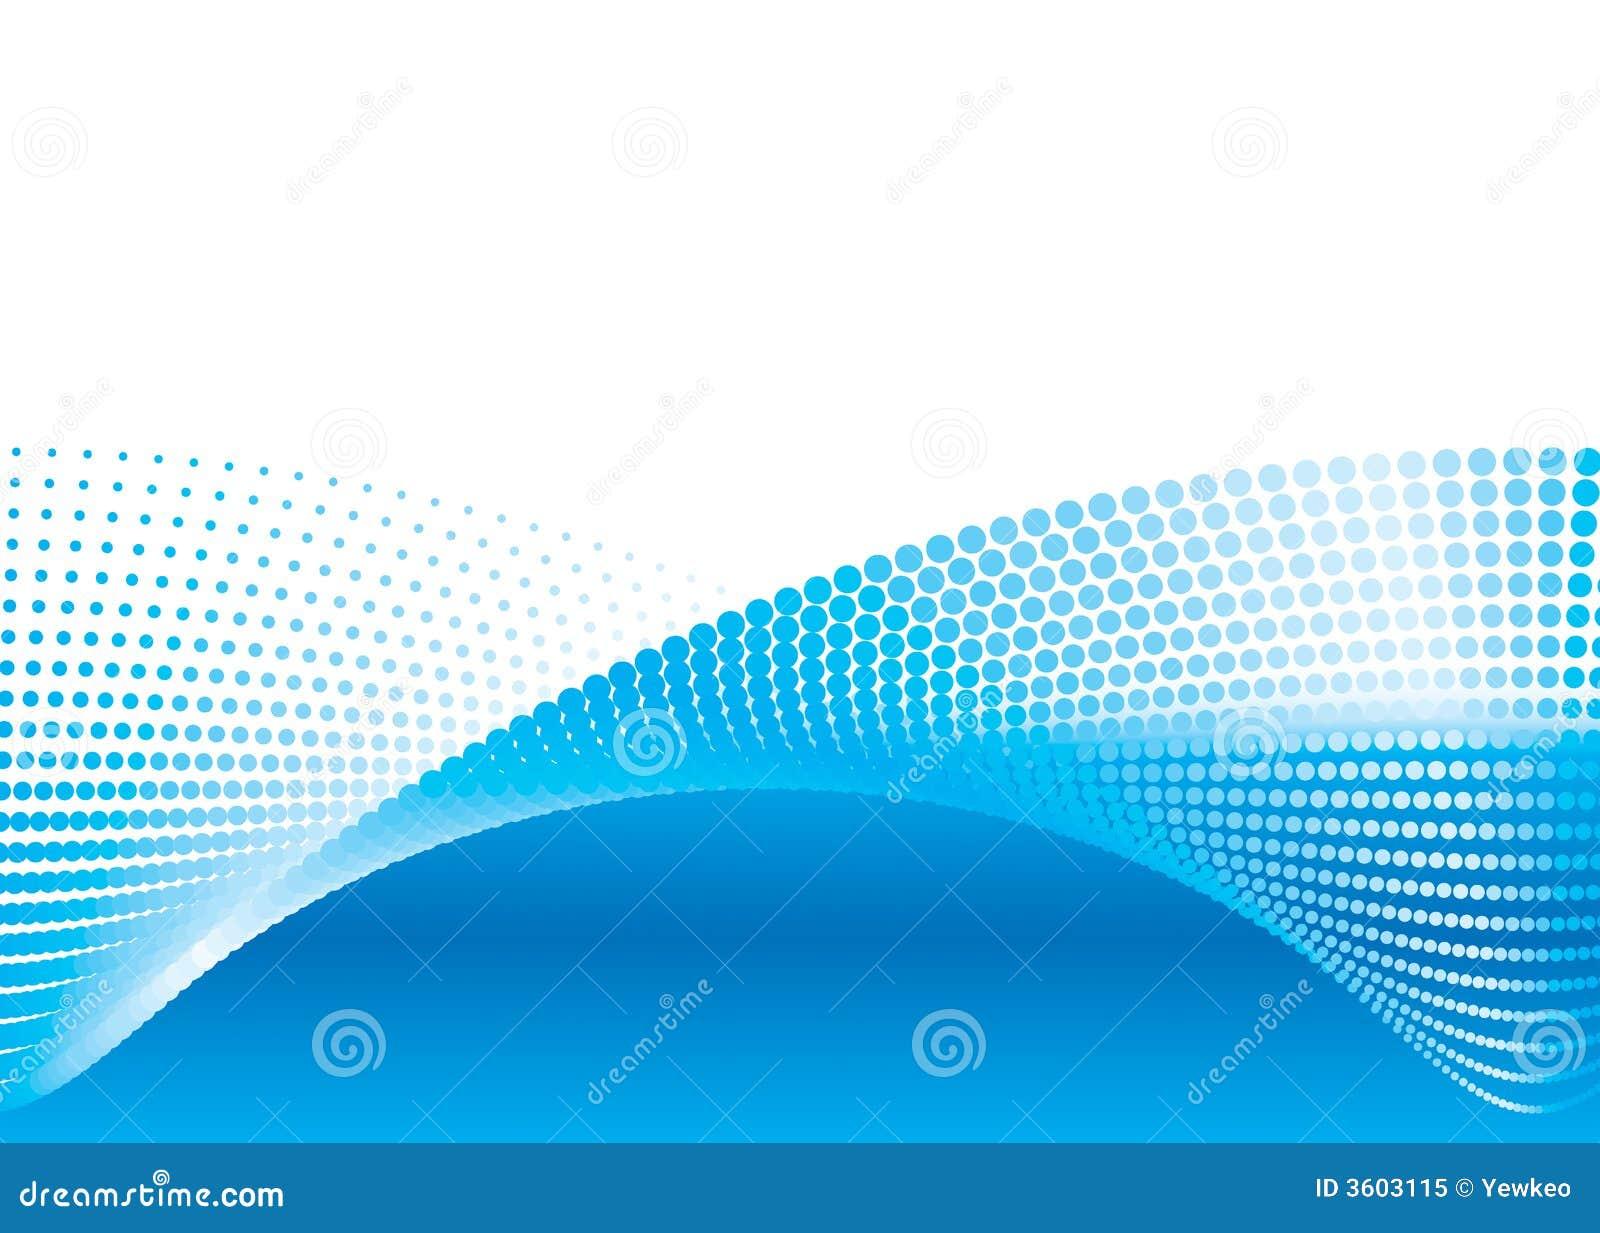 Wave flow